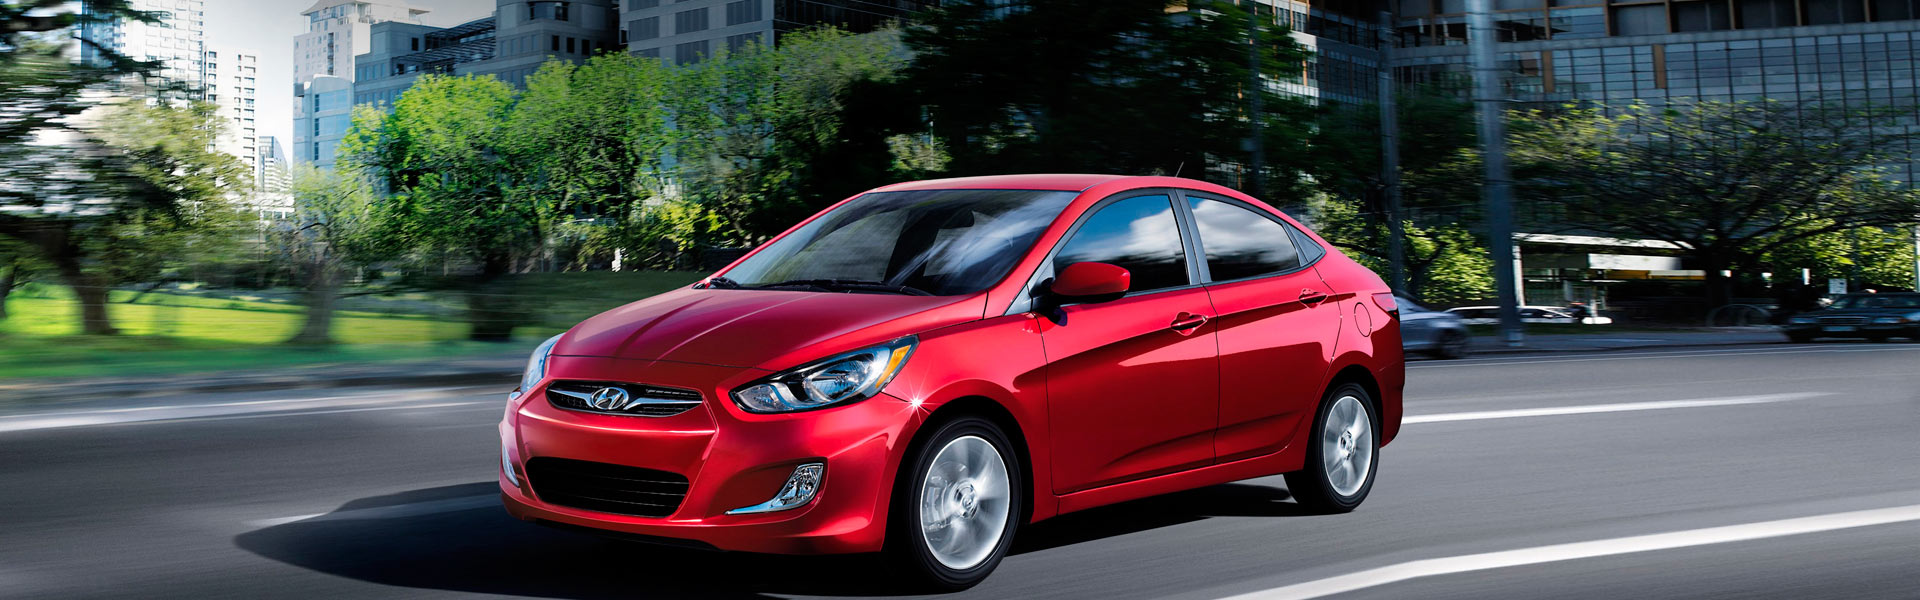 Замена пружины Hyundai Solaris